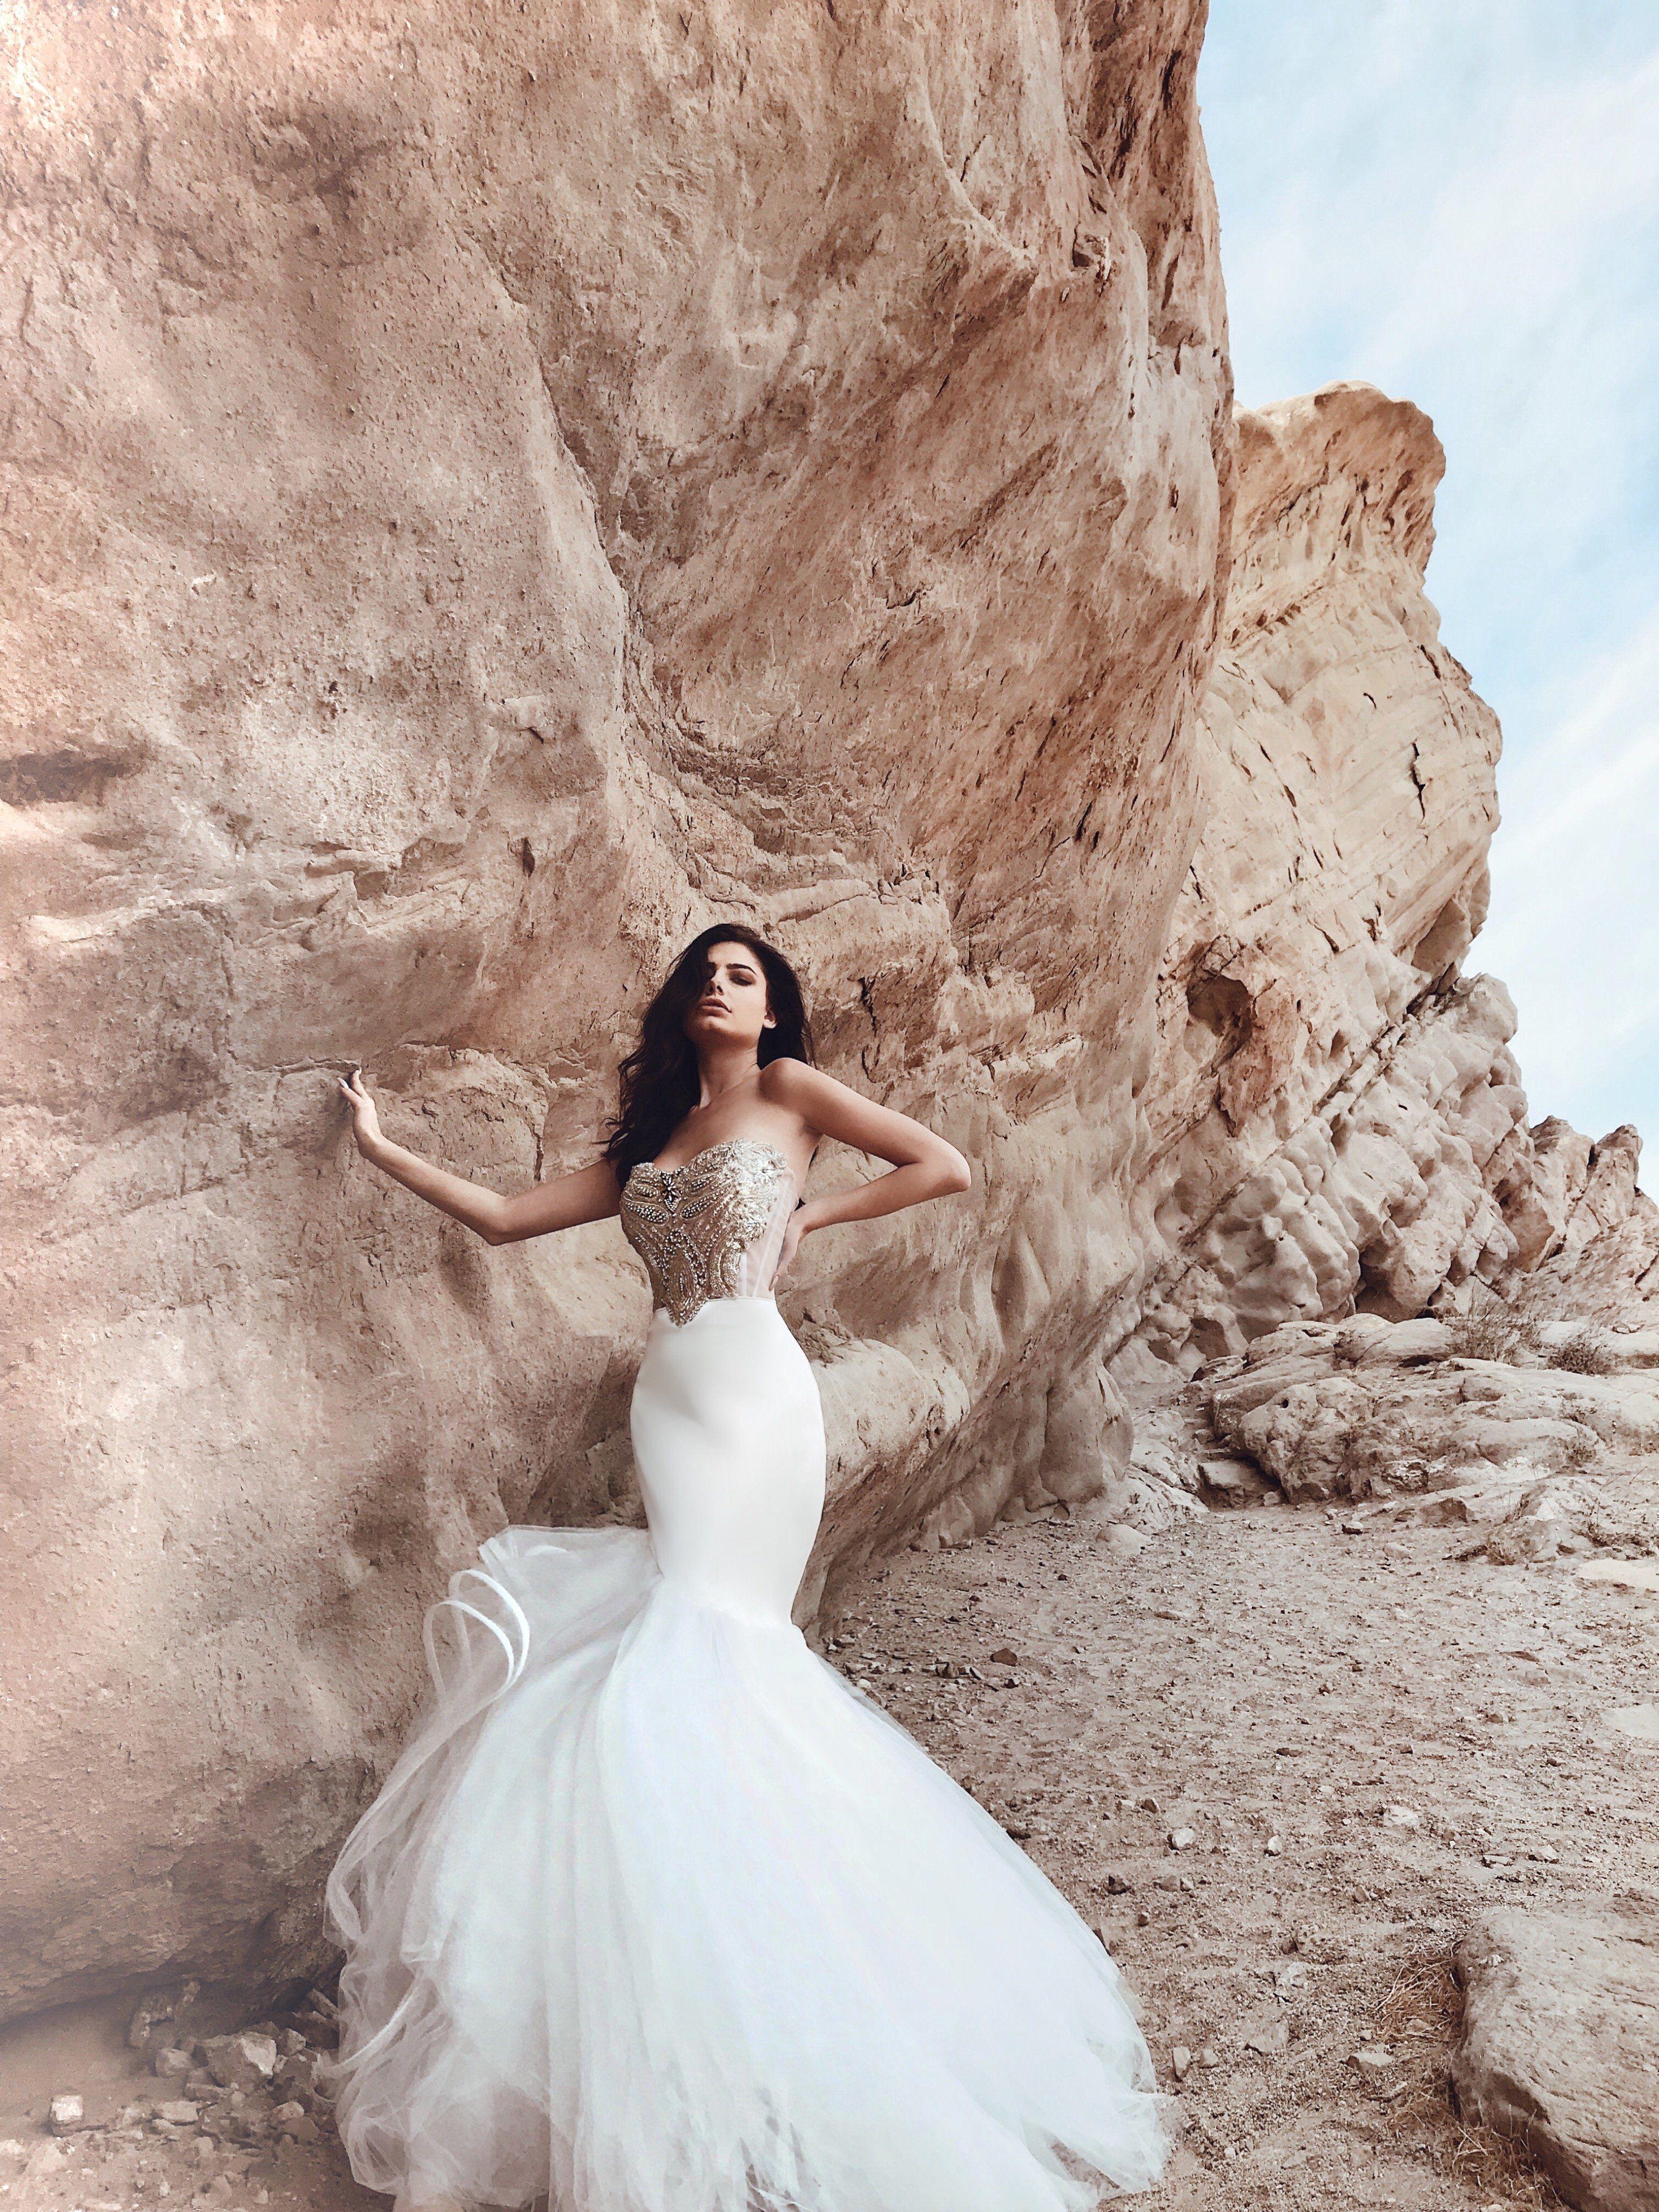 Solstice Wedding Gowns Mermaid Crystal Wedding Dresses Customizable Wedding Dress [ 4095 x 3072 Pixel ]